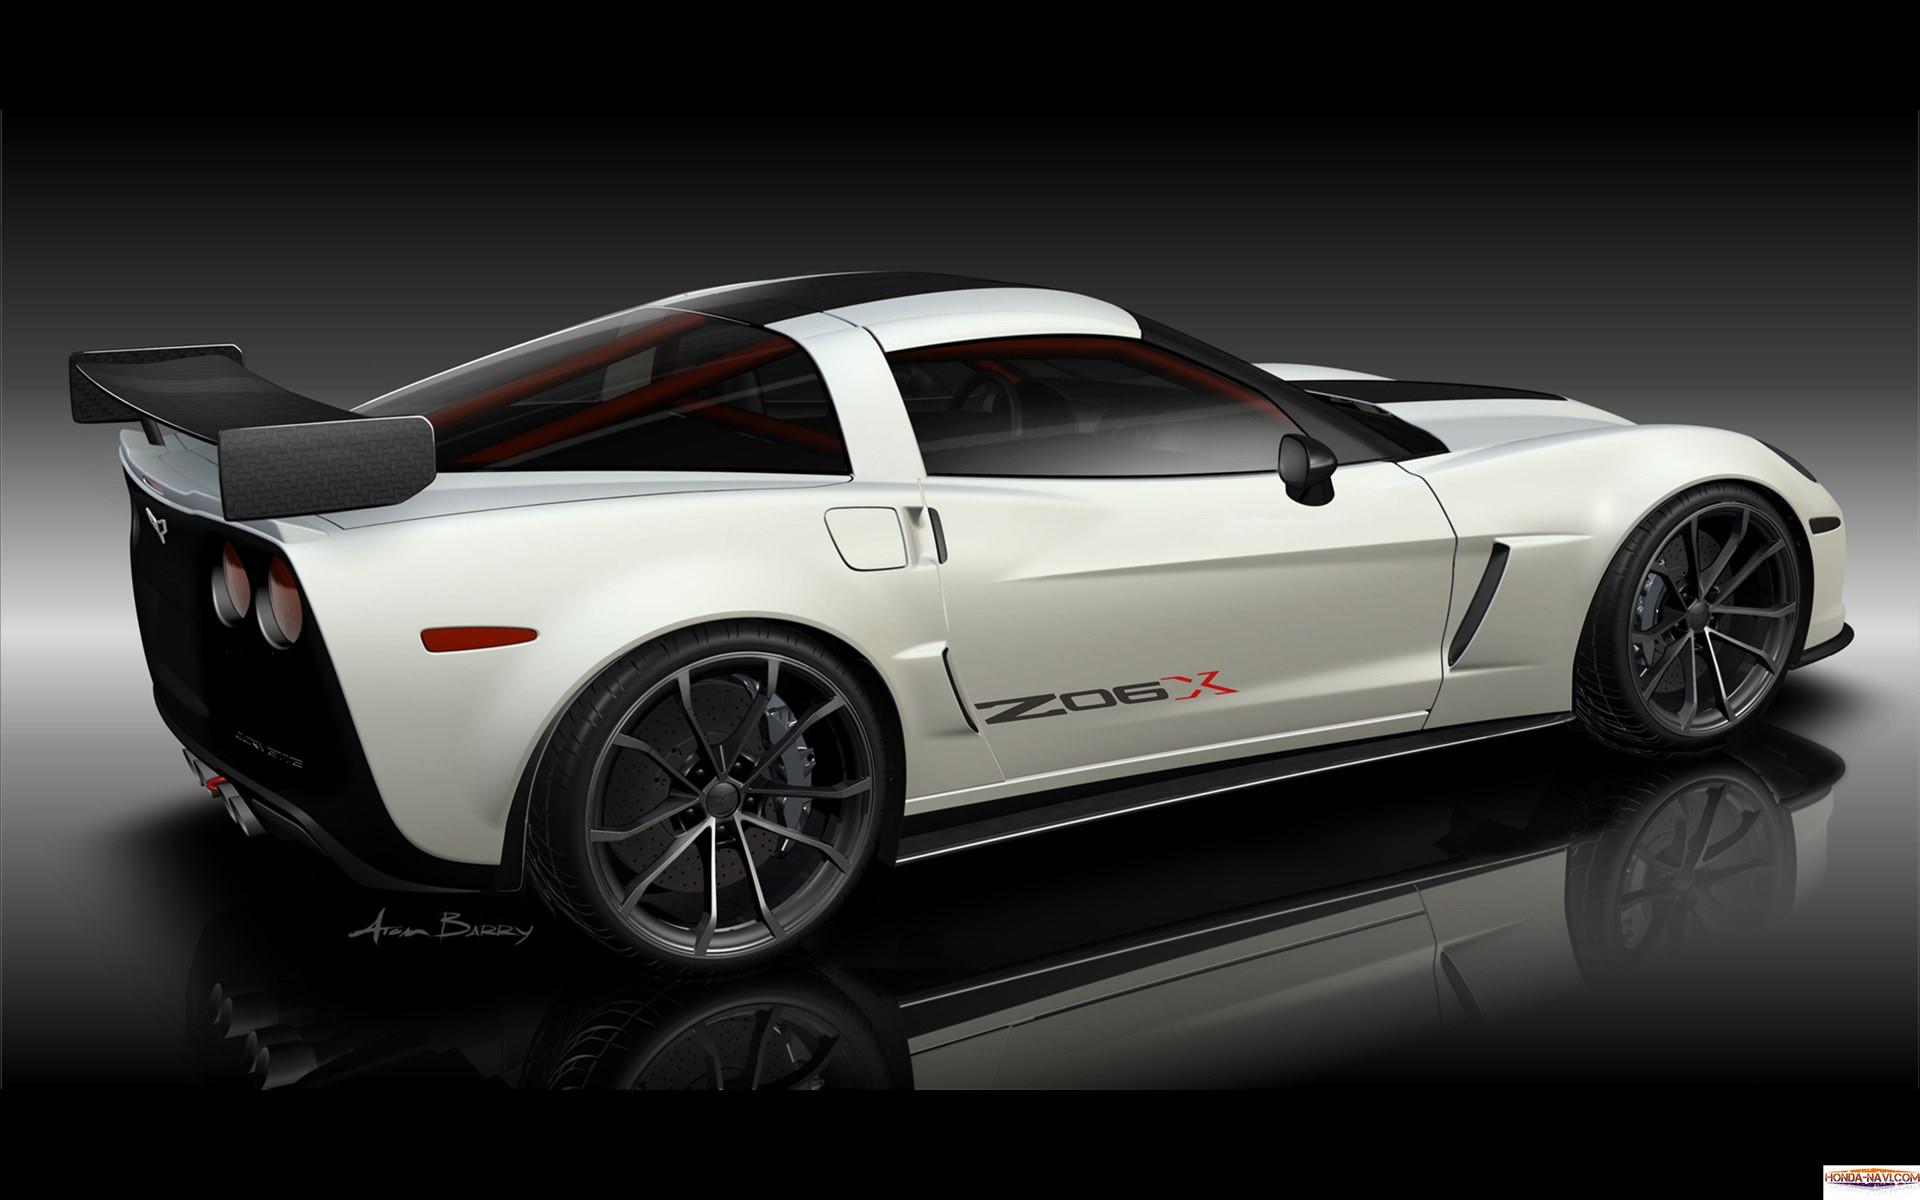 Chevrolet Corvette Grand Sport   HD Cars Wallpapers   Pinterest   Corvette  grand sport, Chevrolet Corvette and Chevrolet